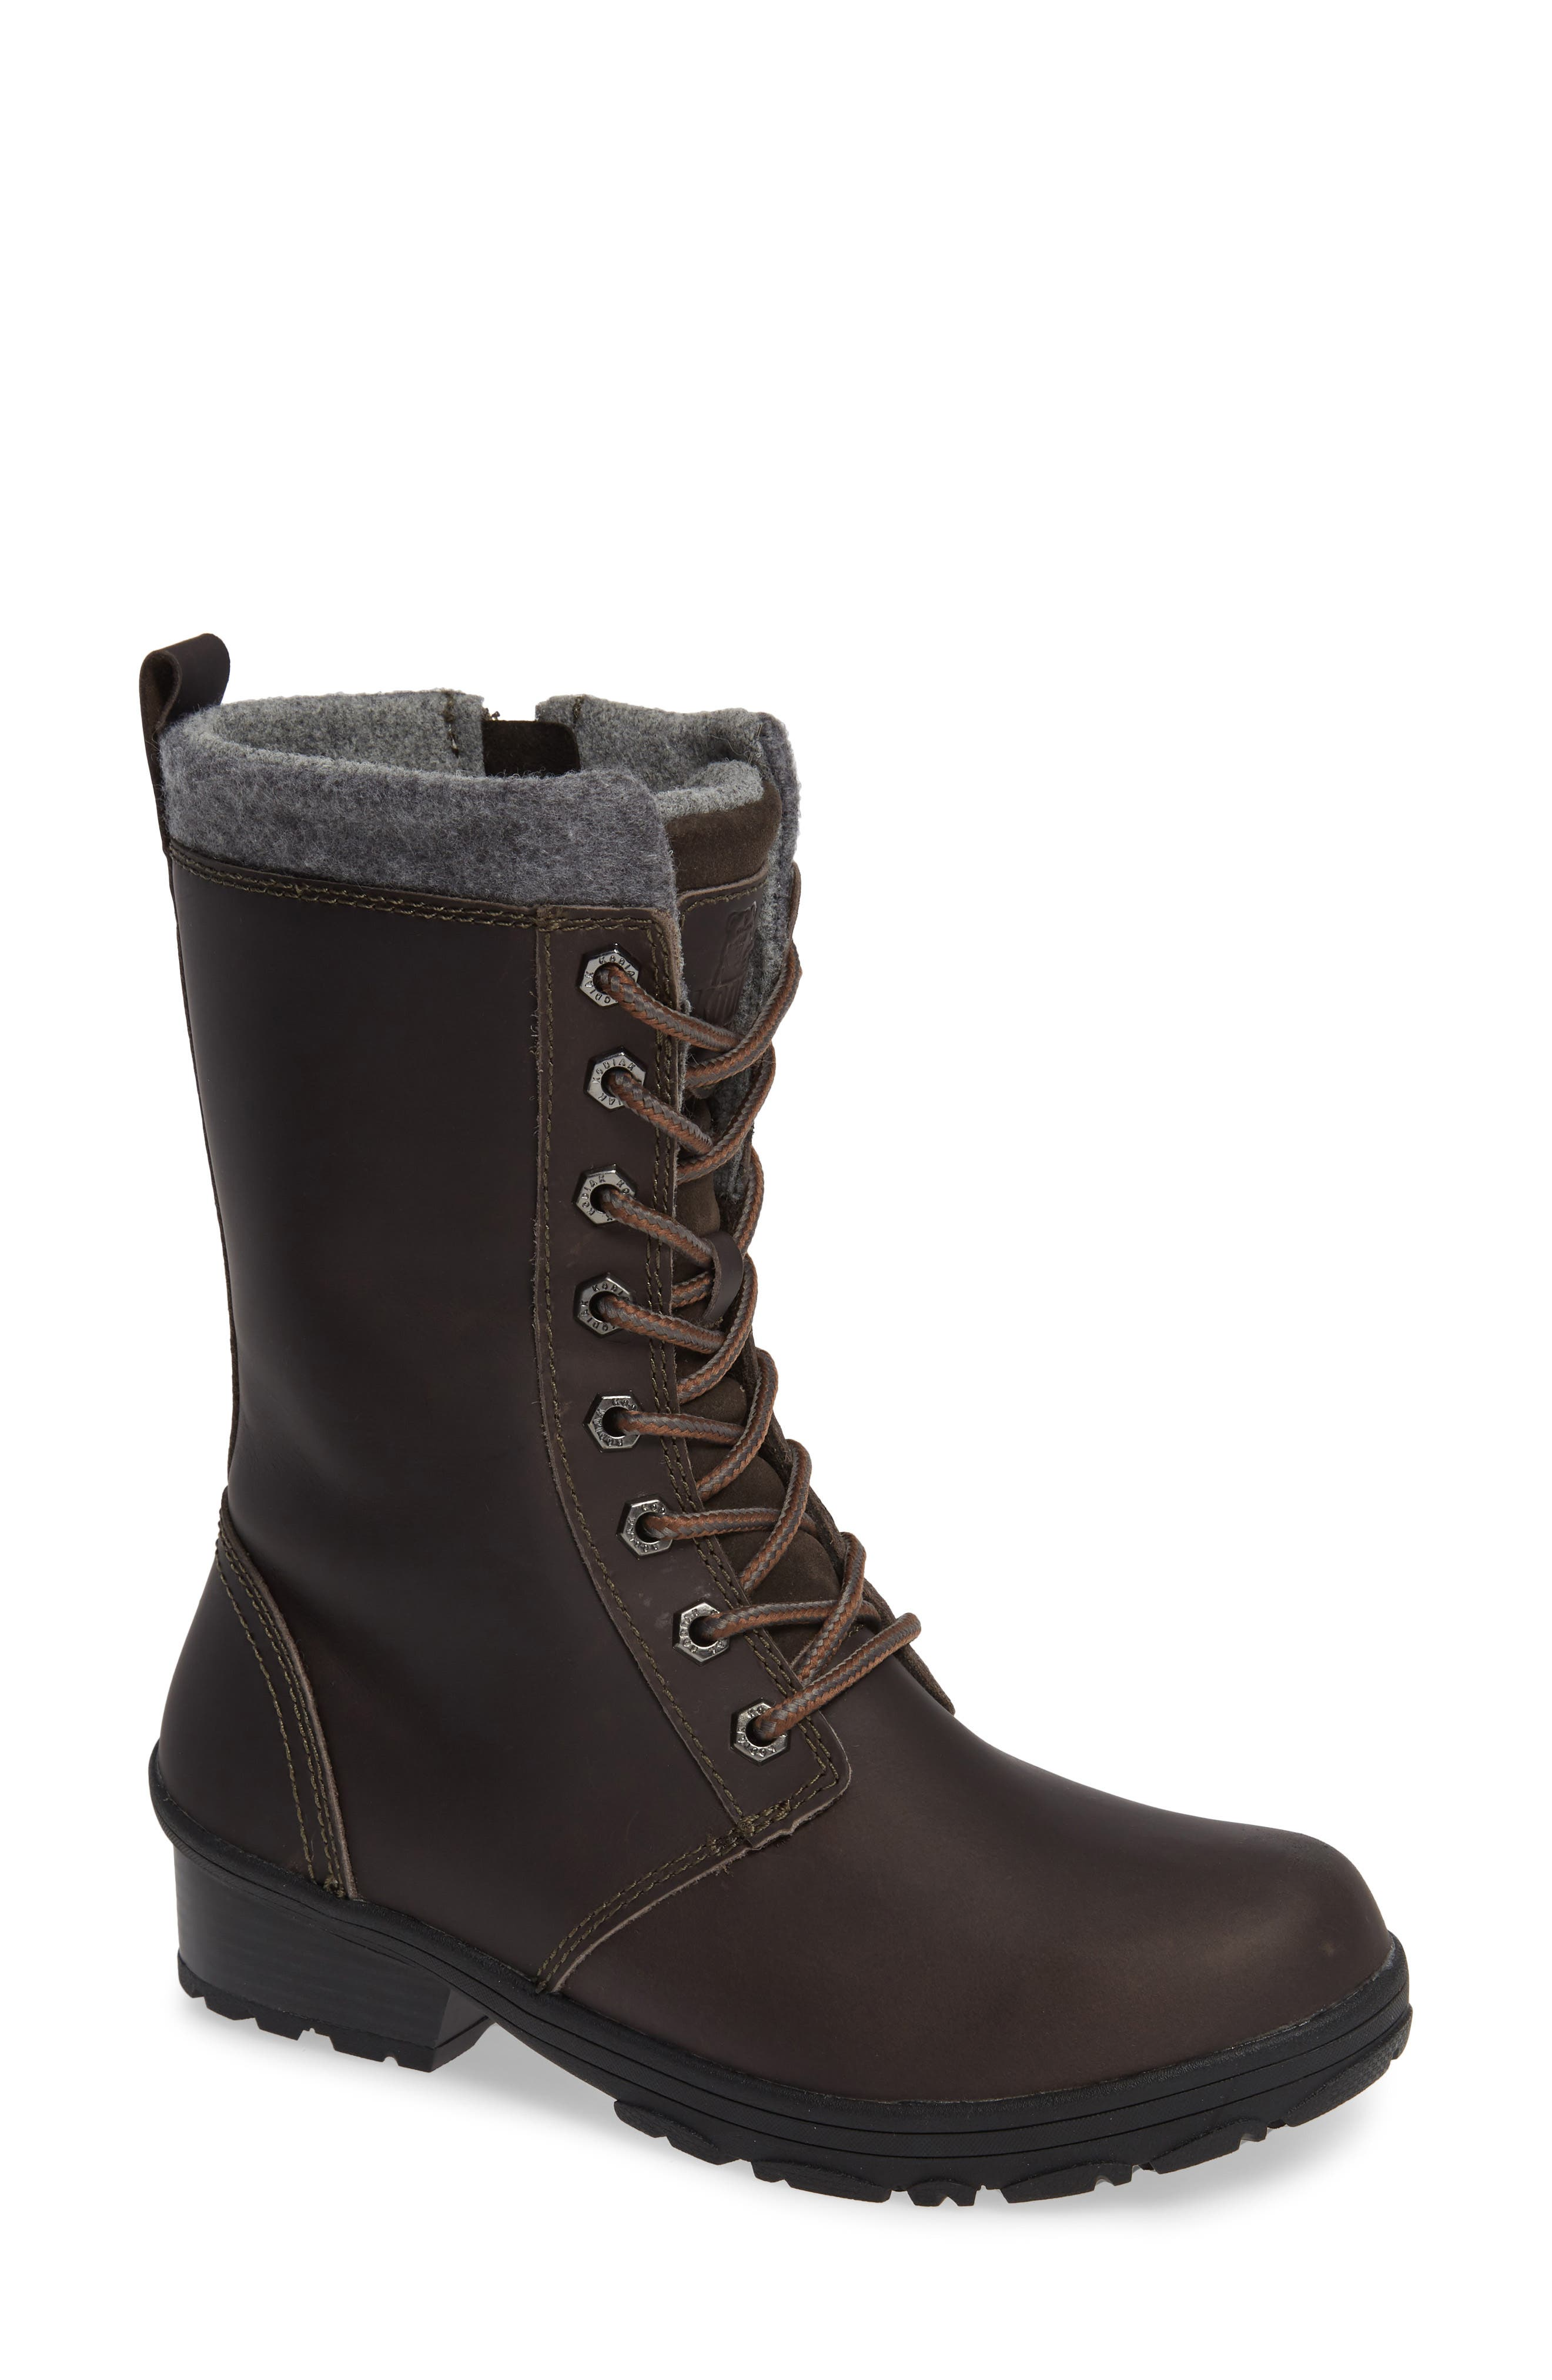 Kodiak Marcia Insulated Waterproof Boot, Grey